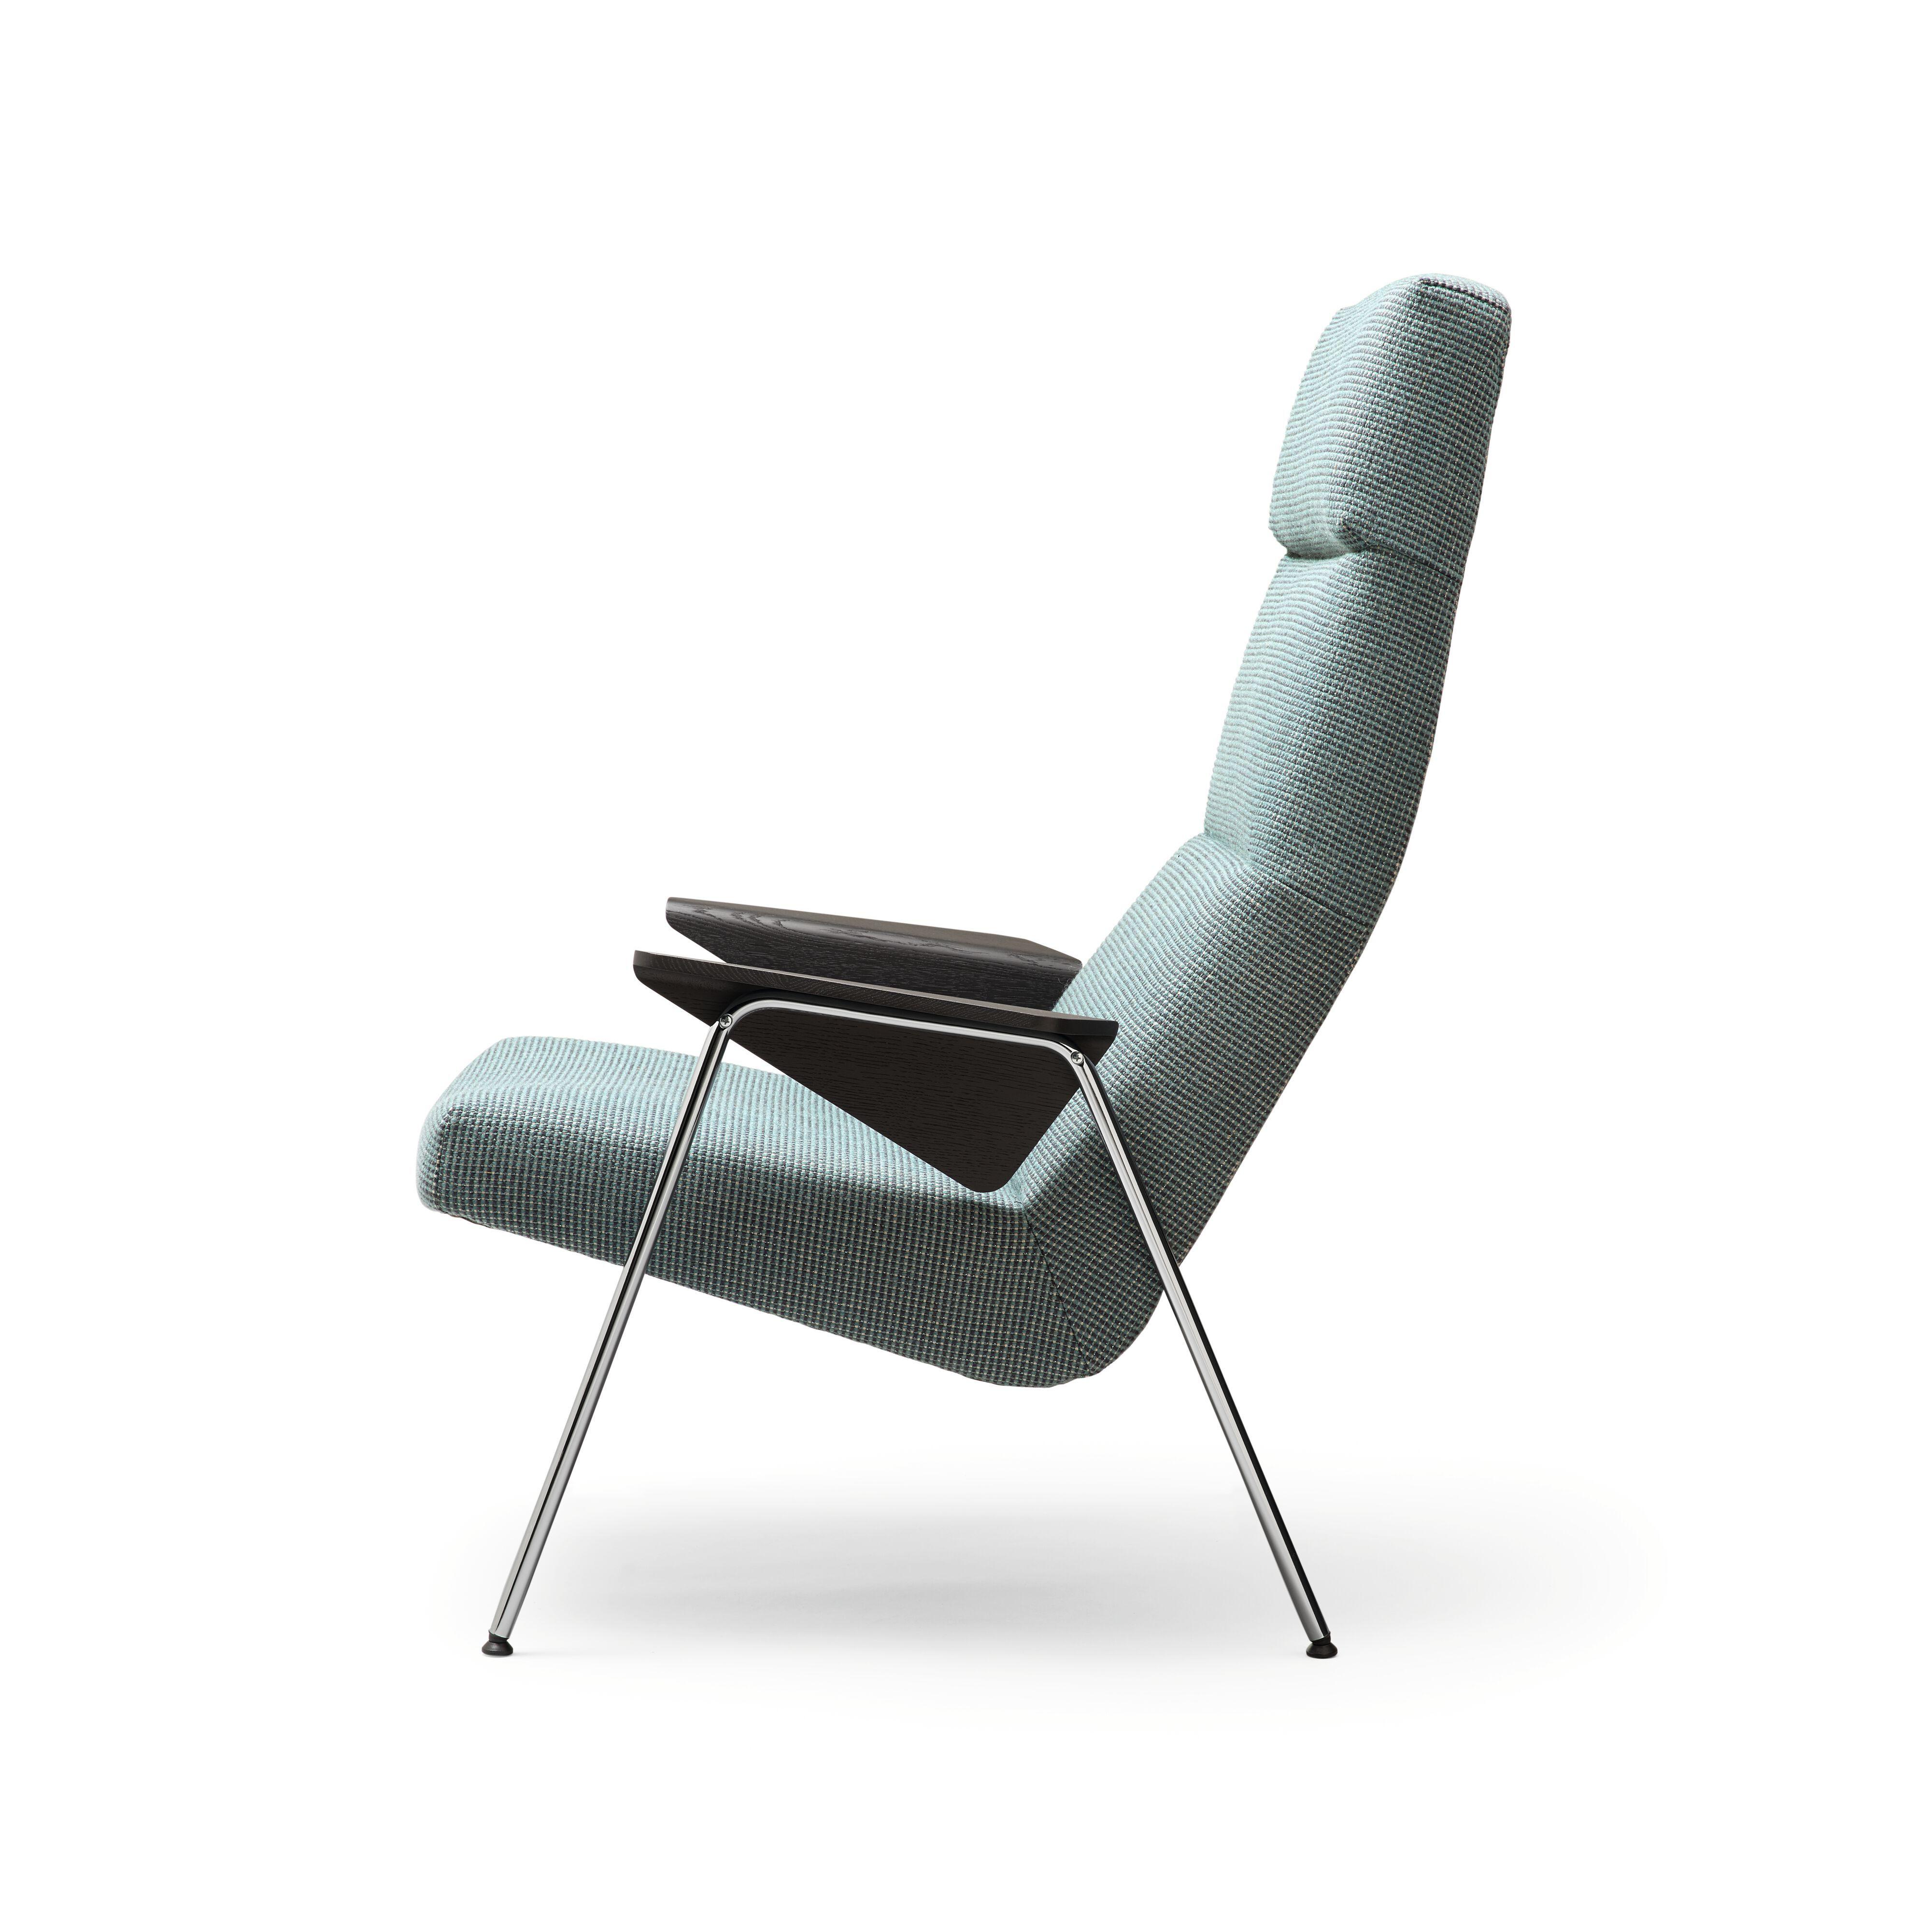 02-WK-Classic_Edition-Votteler_Chair-0015-H.tif